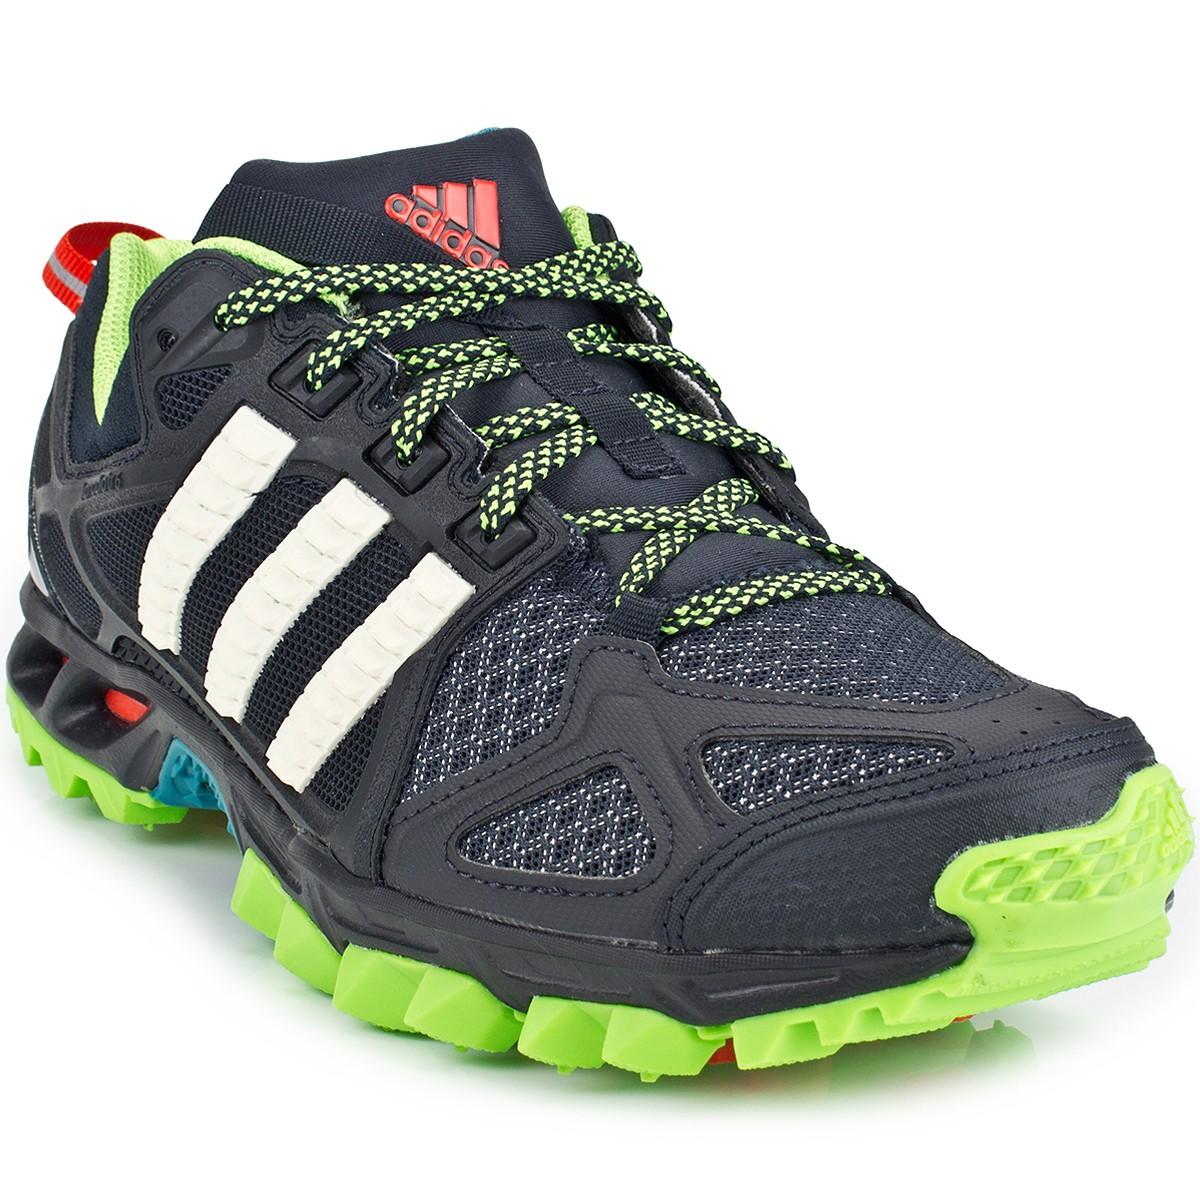 850b3a1a2c Tênis Adidas Kanadia 6 TR